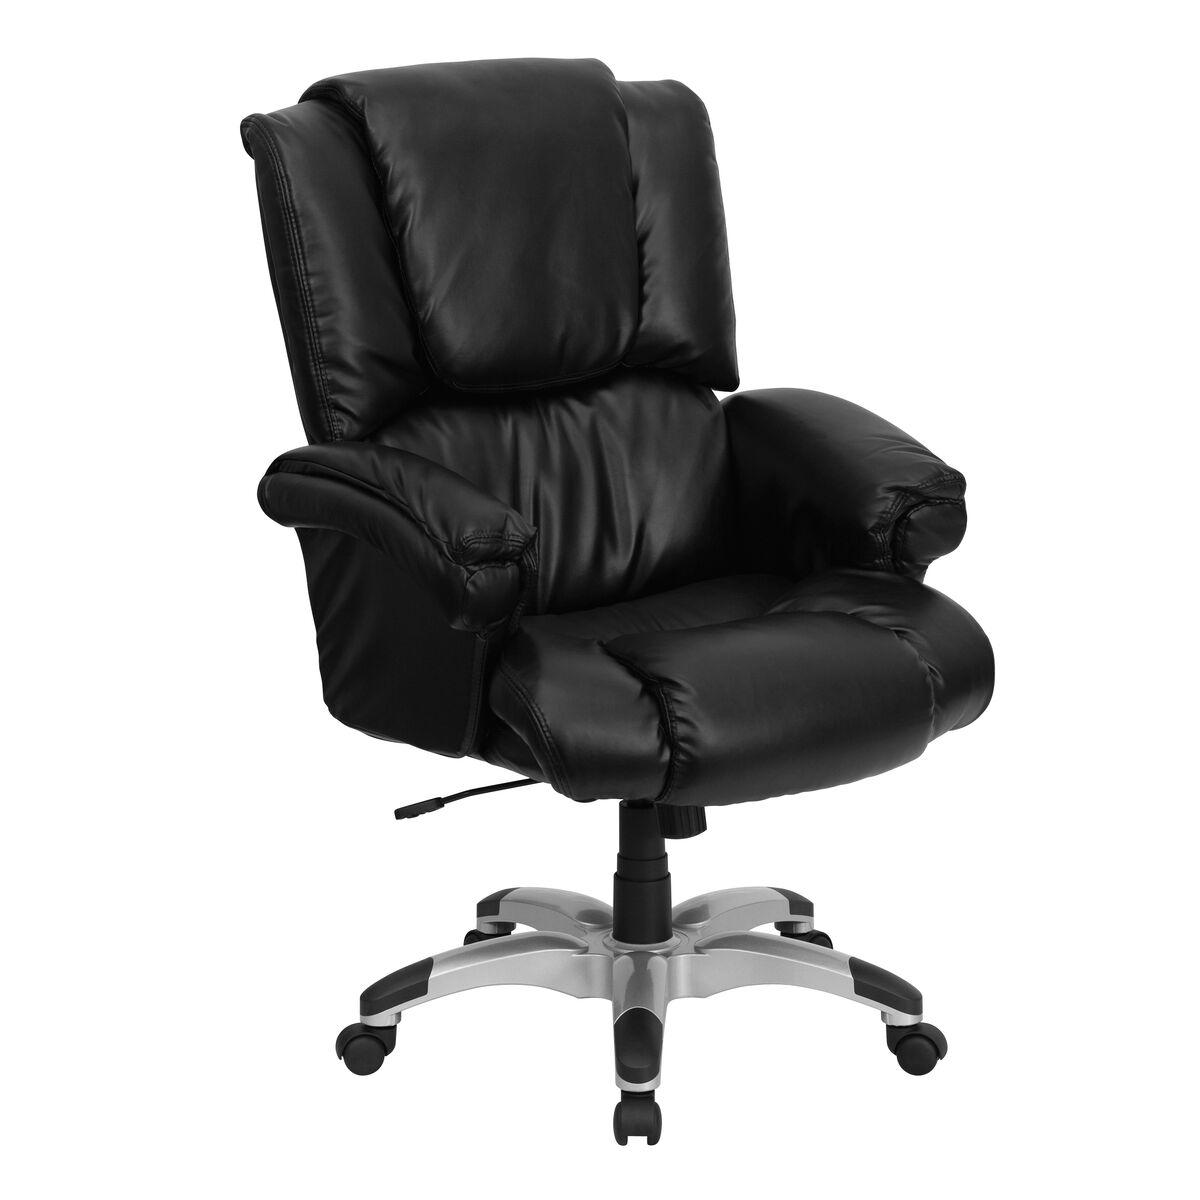 black high back leather chair go 958 bk gg bizchair com